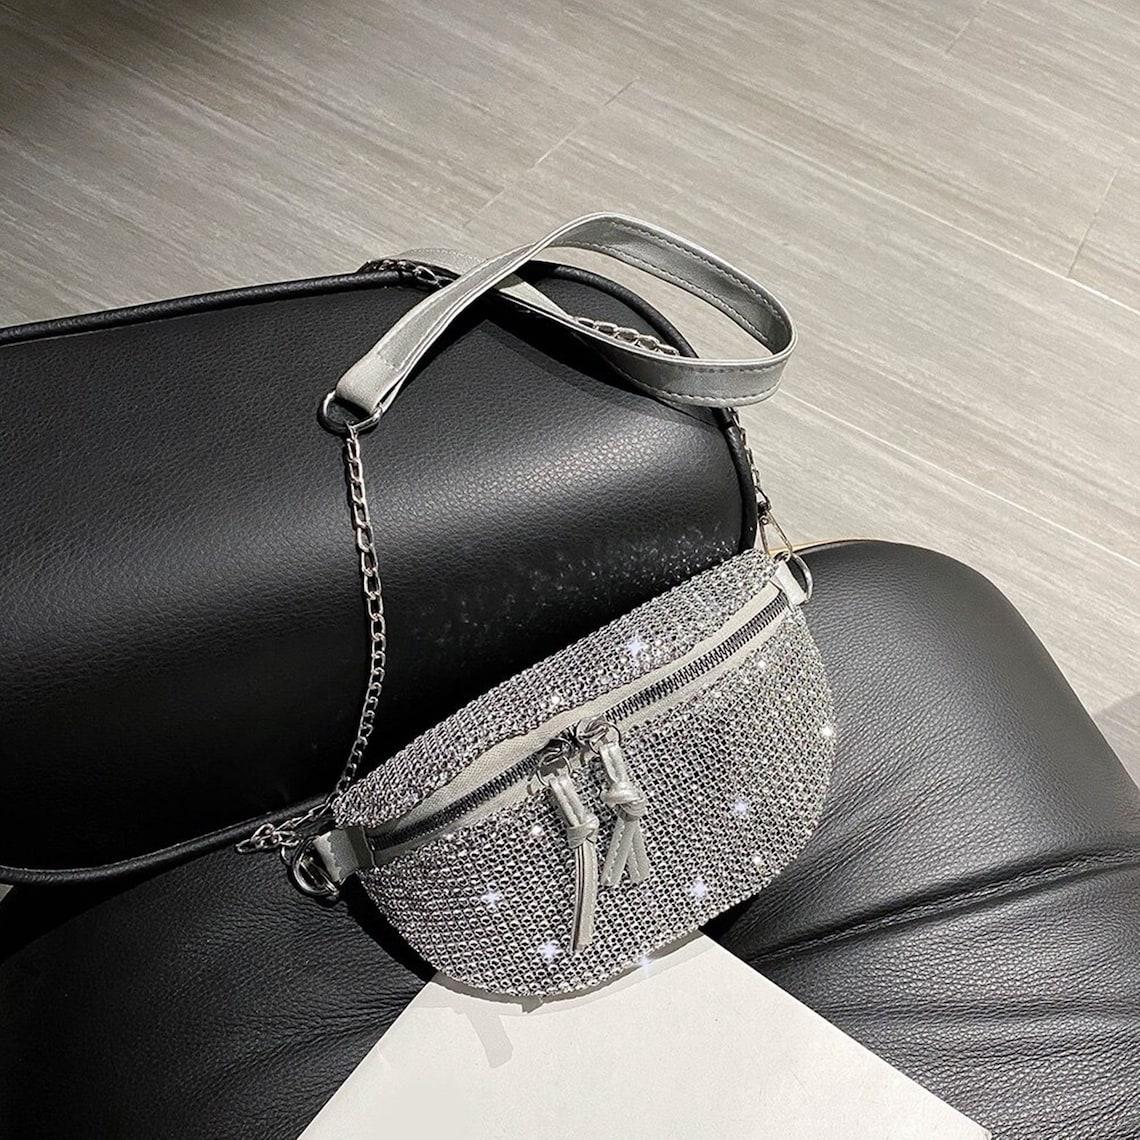 HB-161 Rhinestone Handbag - GLITTER FASHION